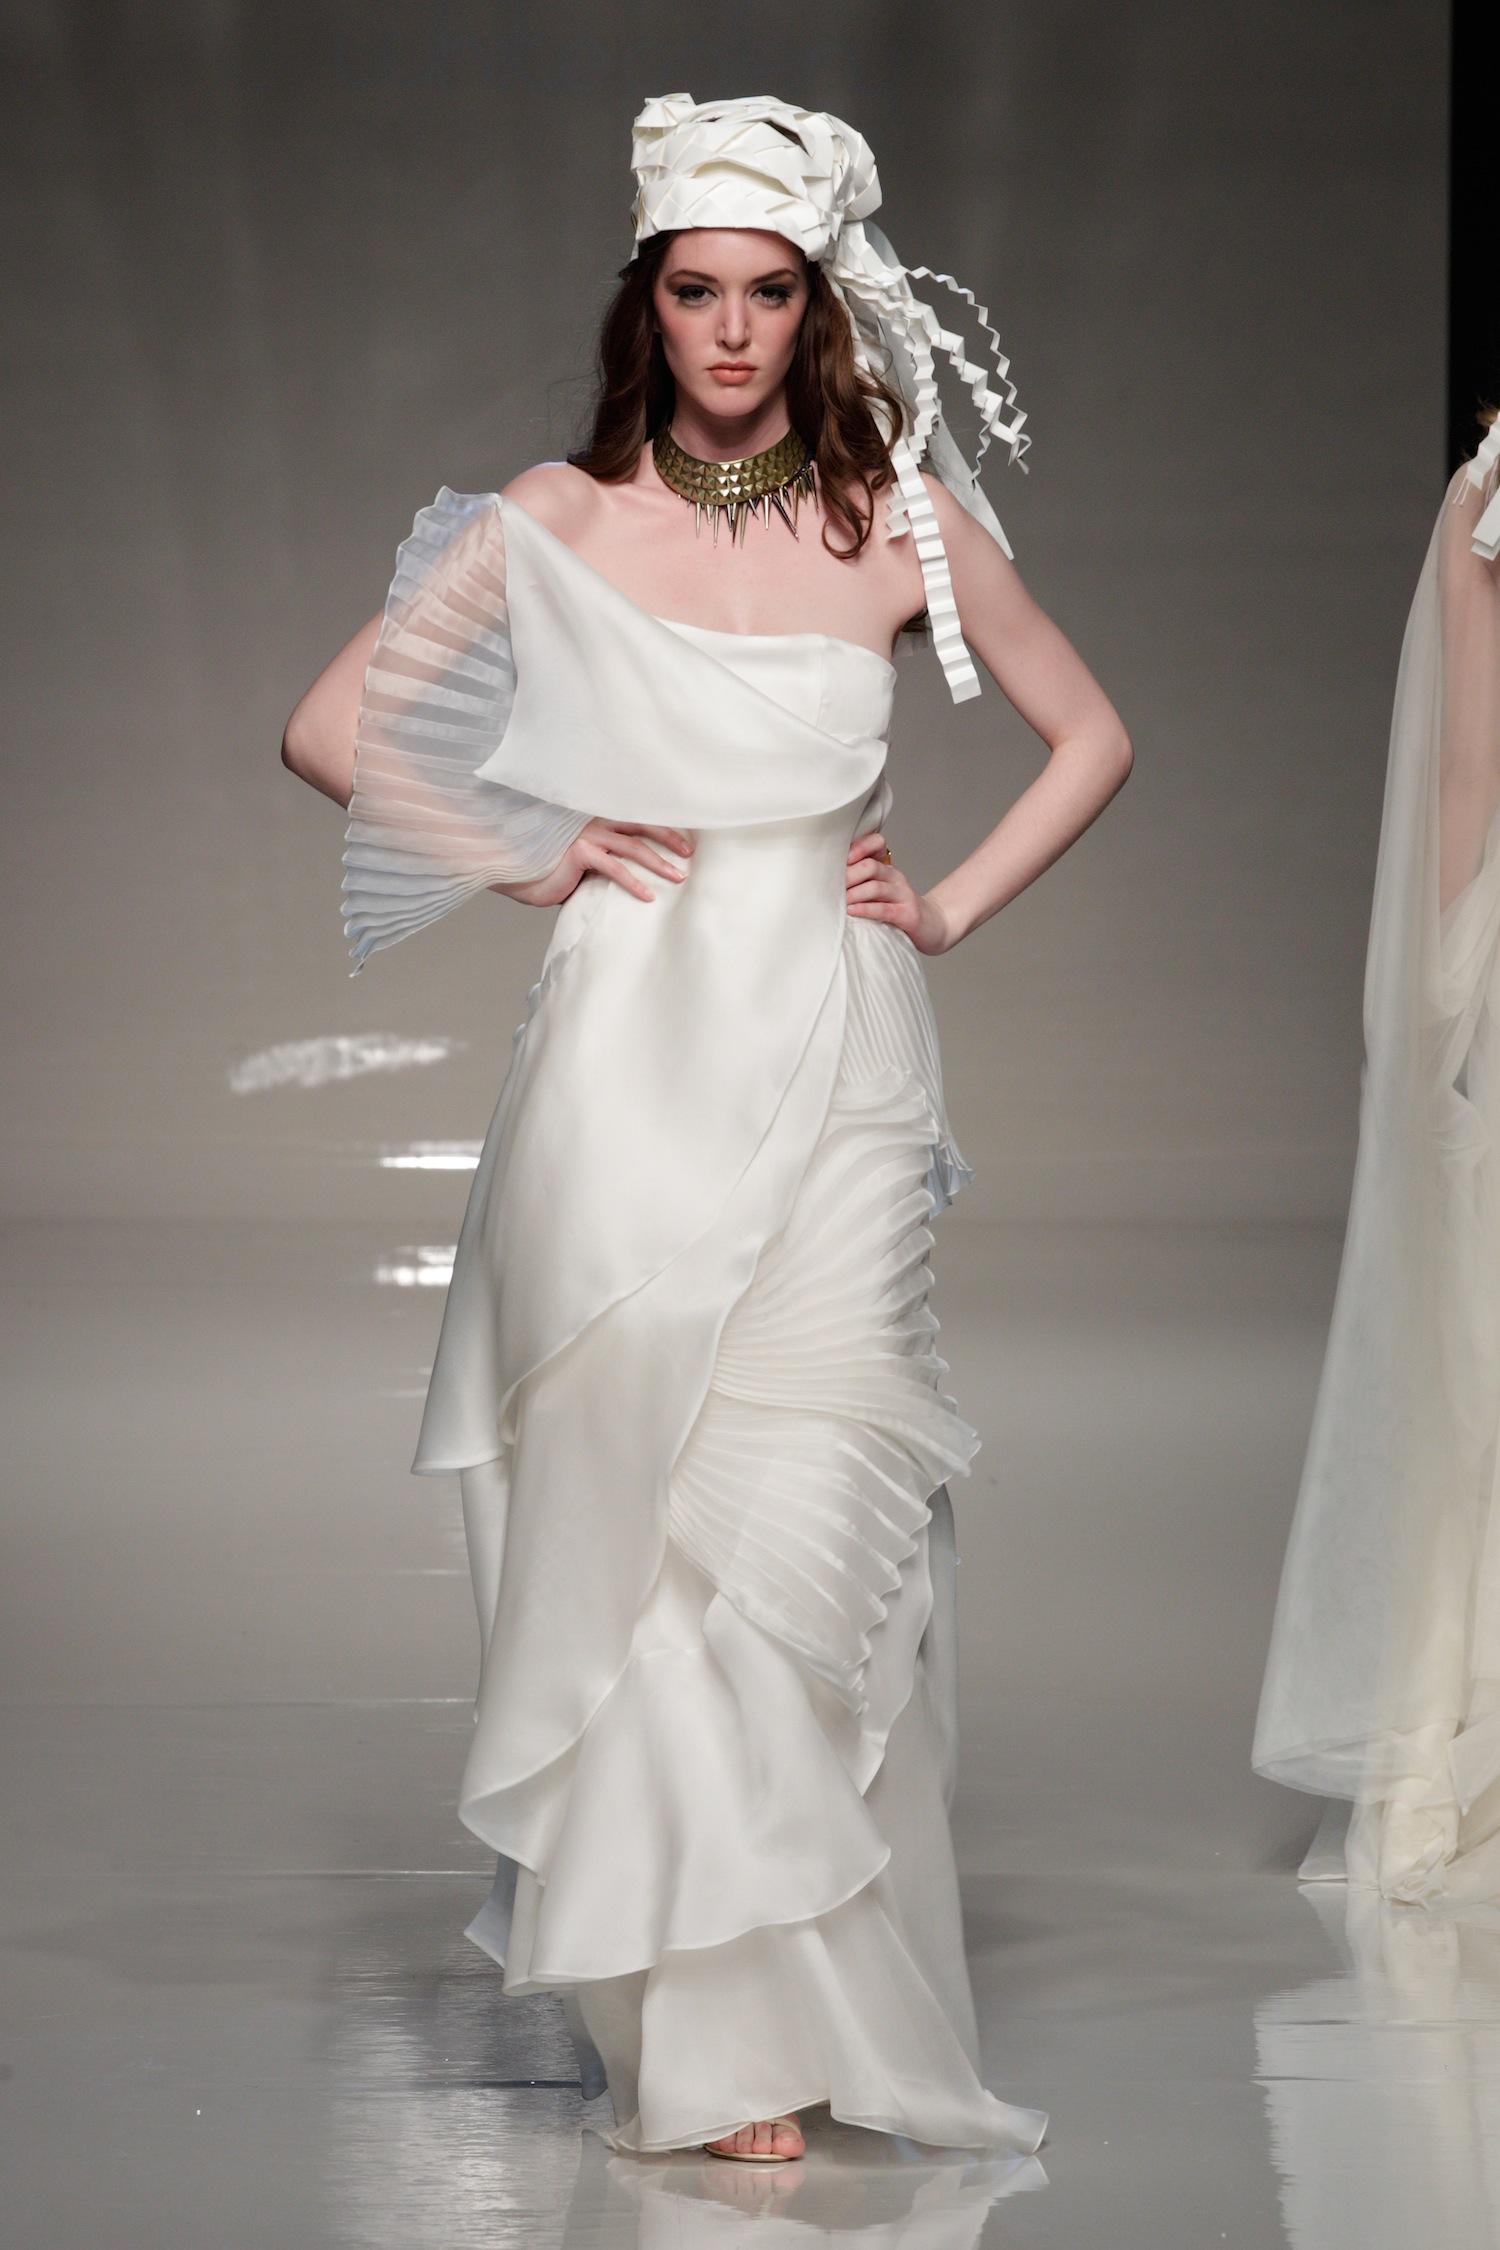 Luxury Wedding Dress Shops Cheap London – Wedding